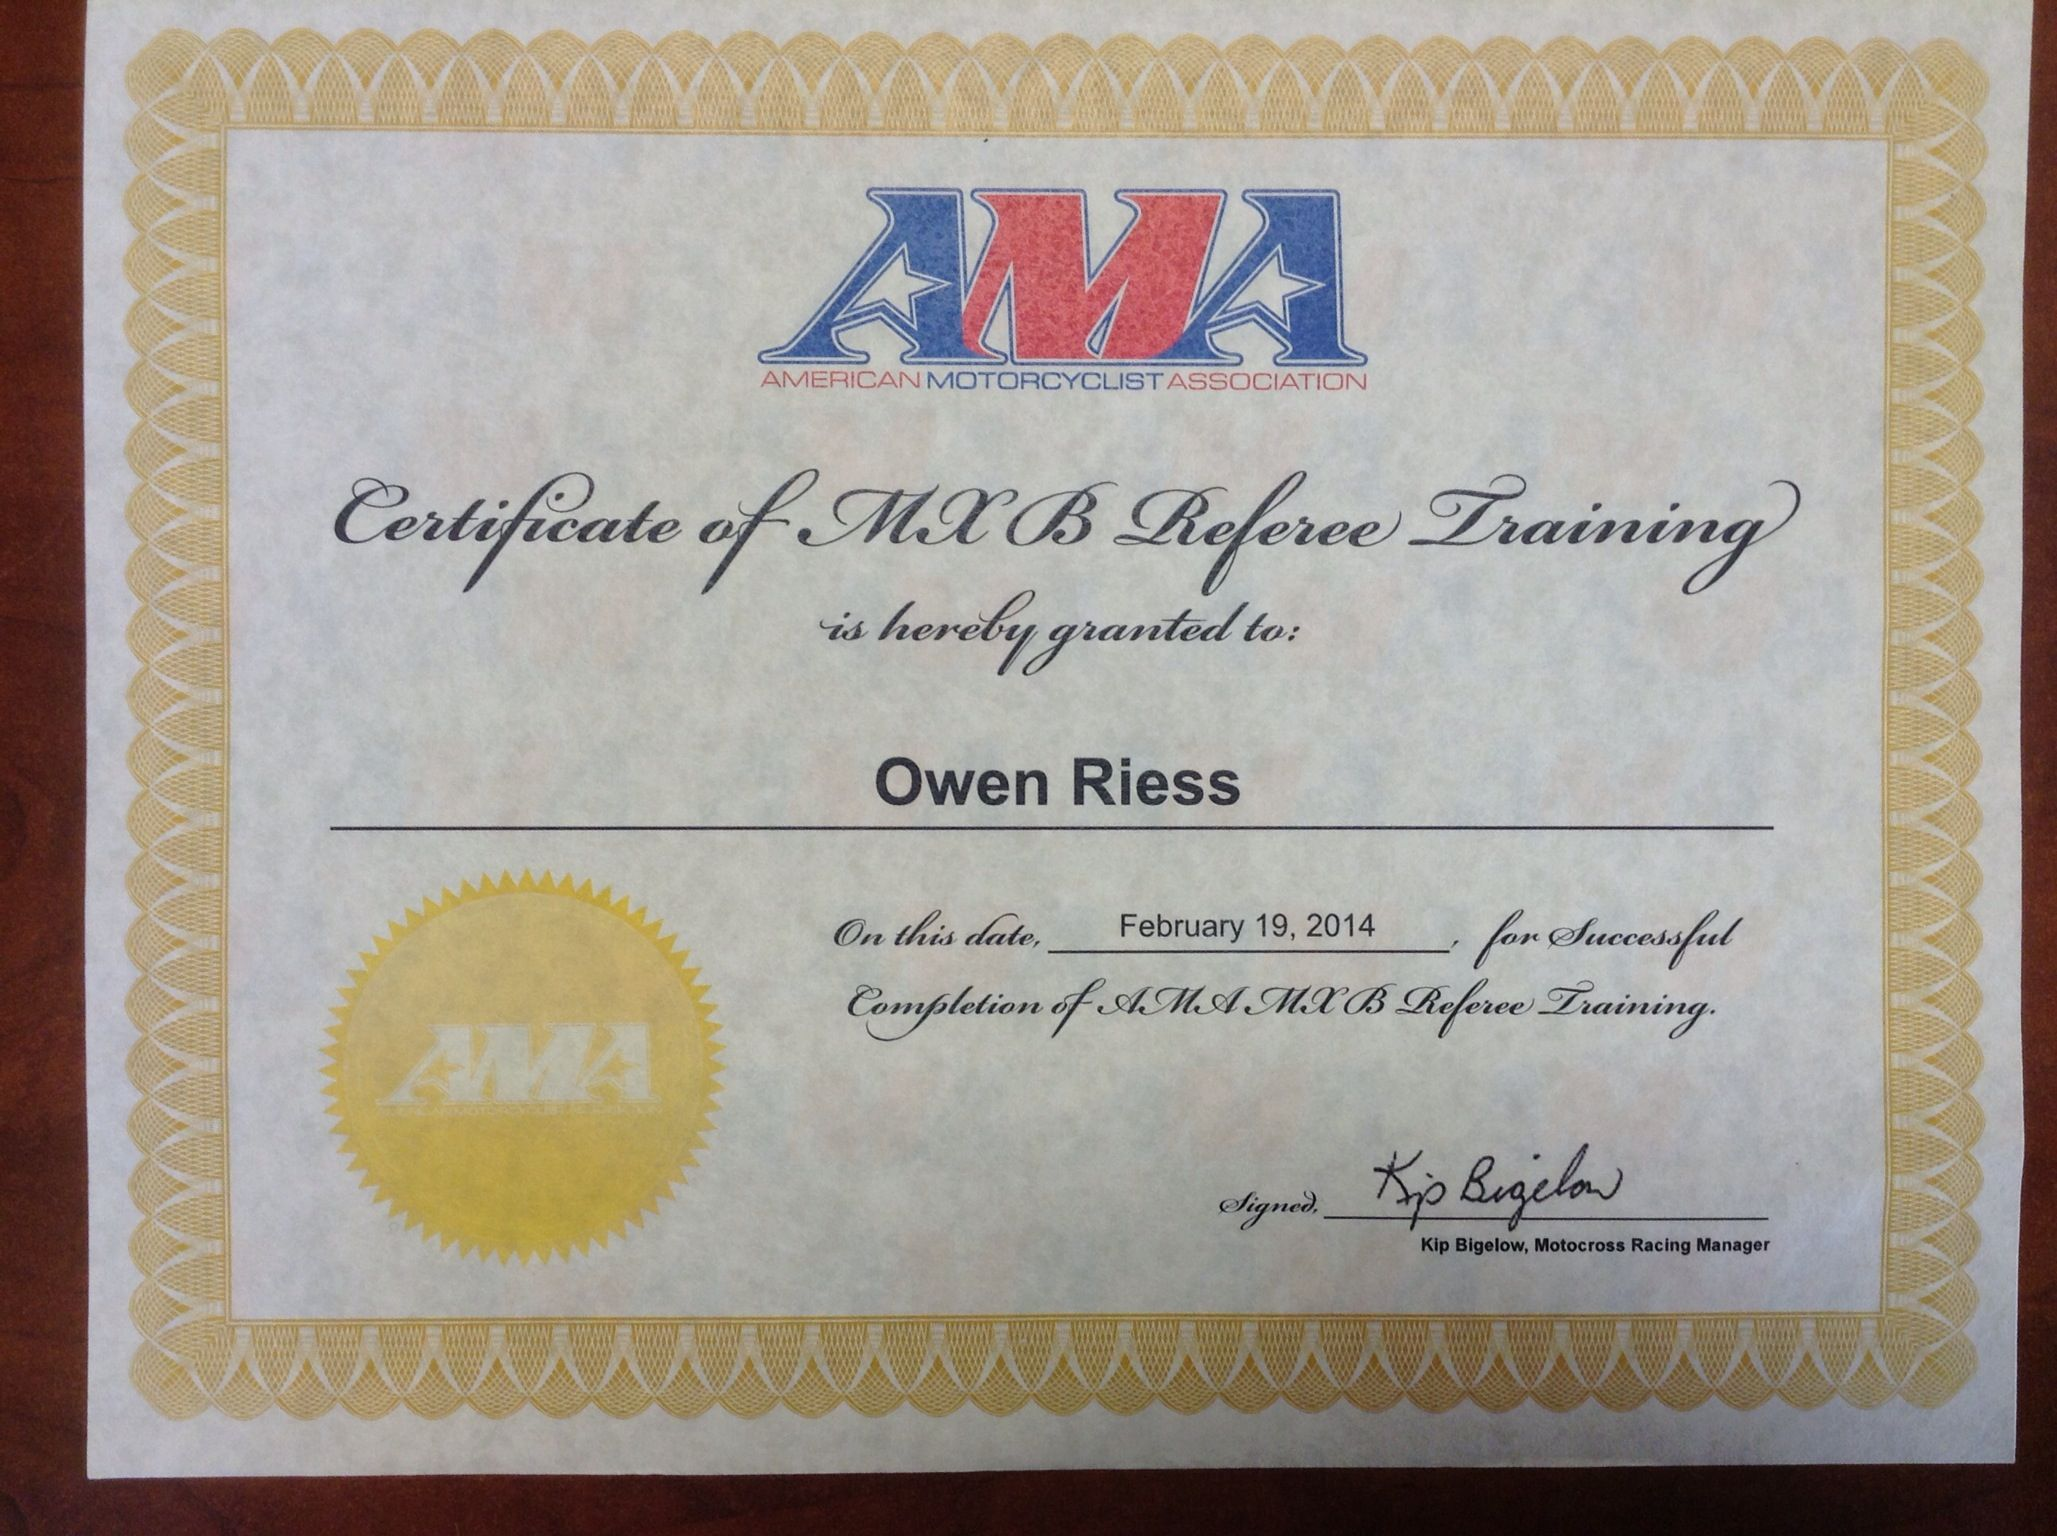 Ama Certificate Of Motocross B Referee Training Owen Riess